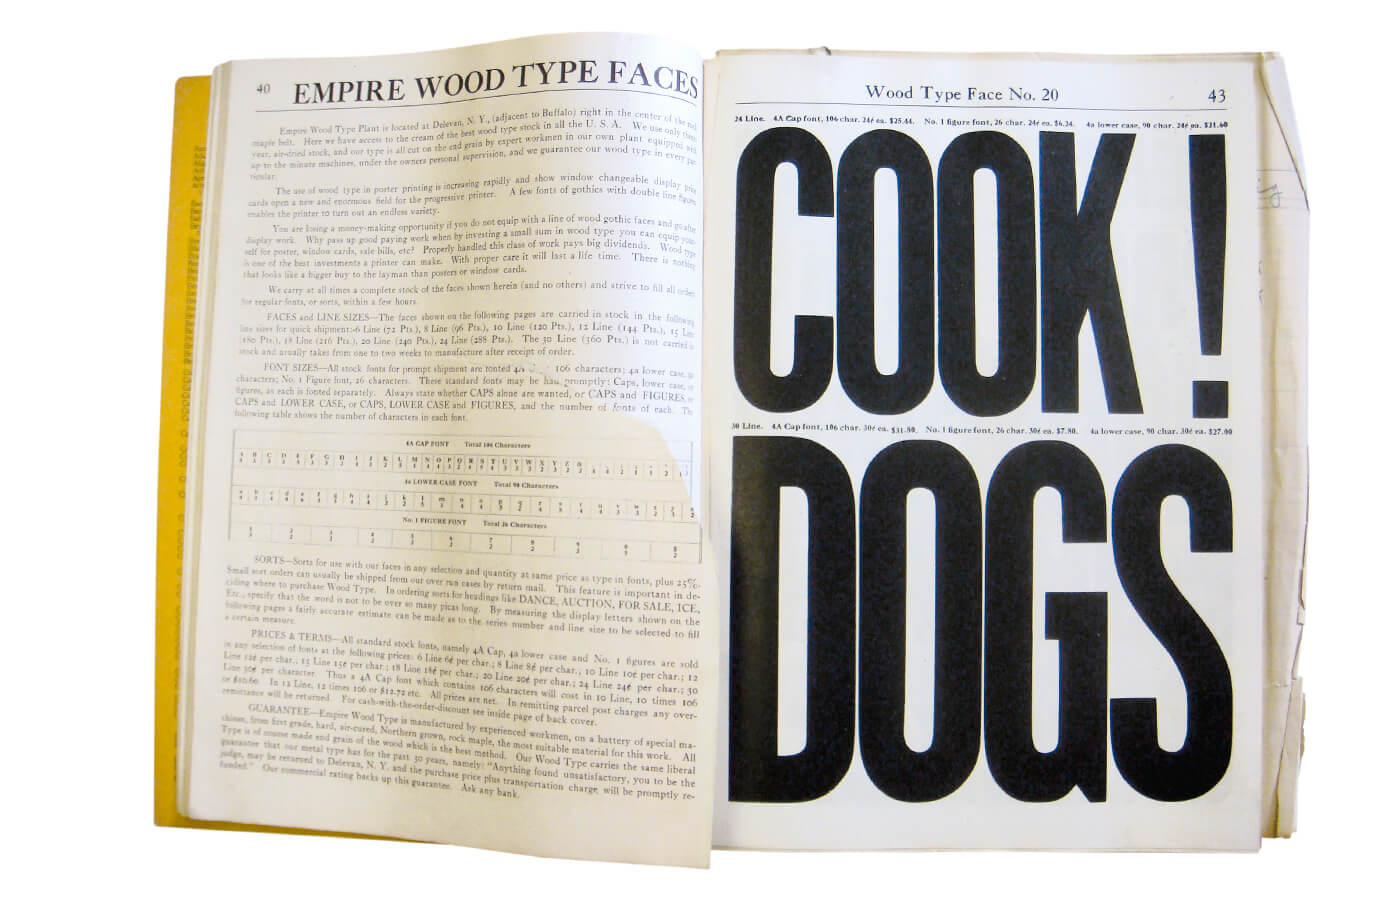 Catalogue no. 18, effective October 1st, 1923